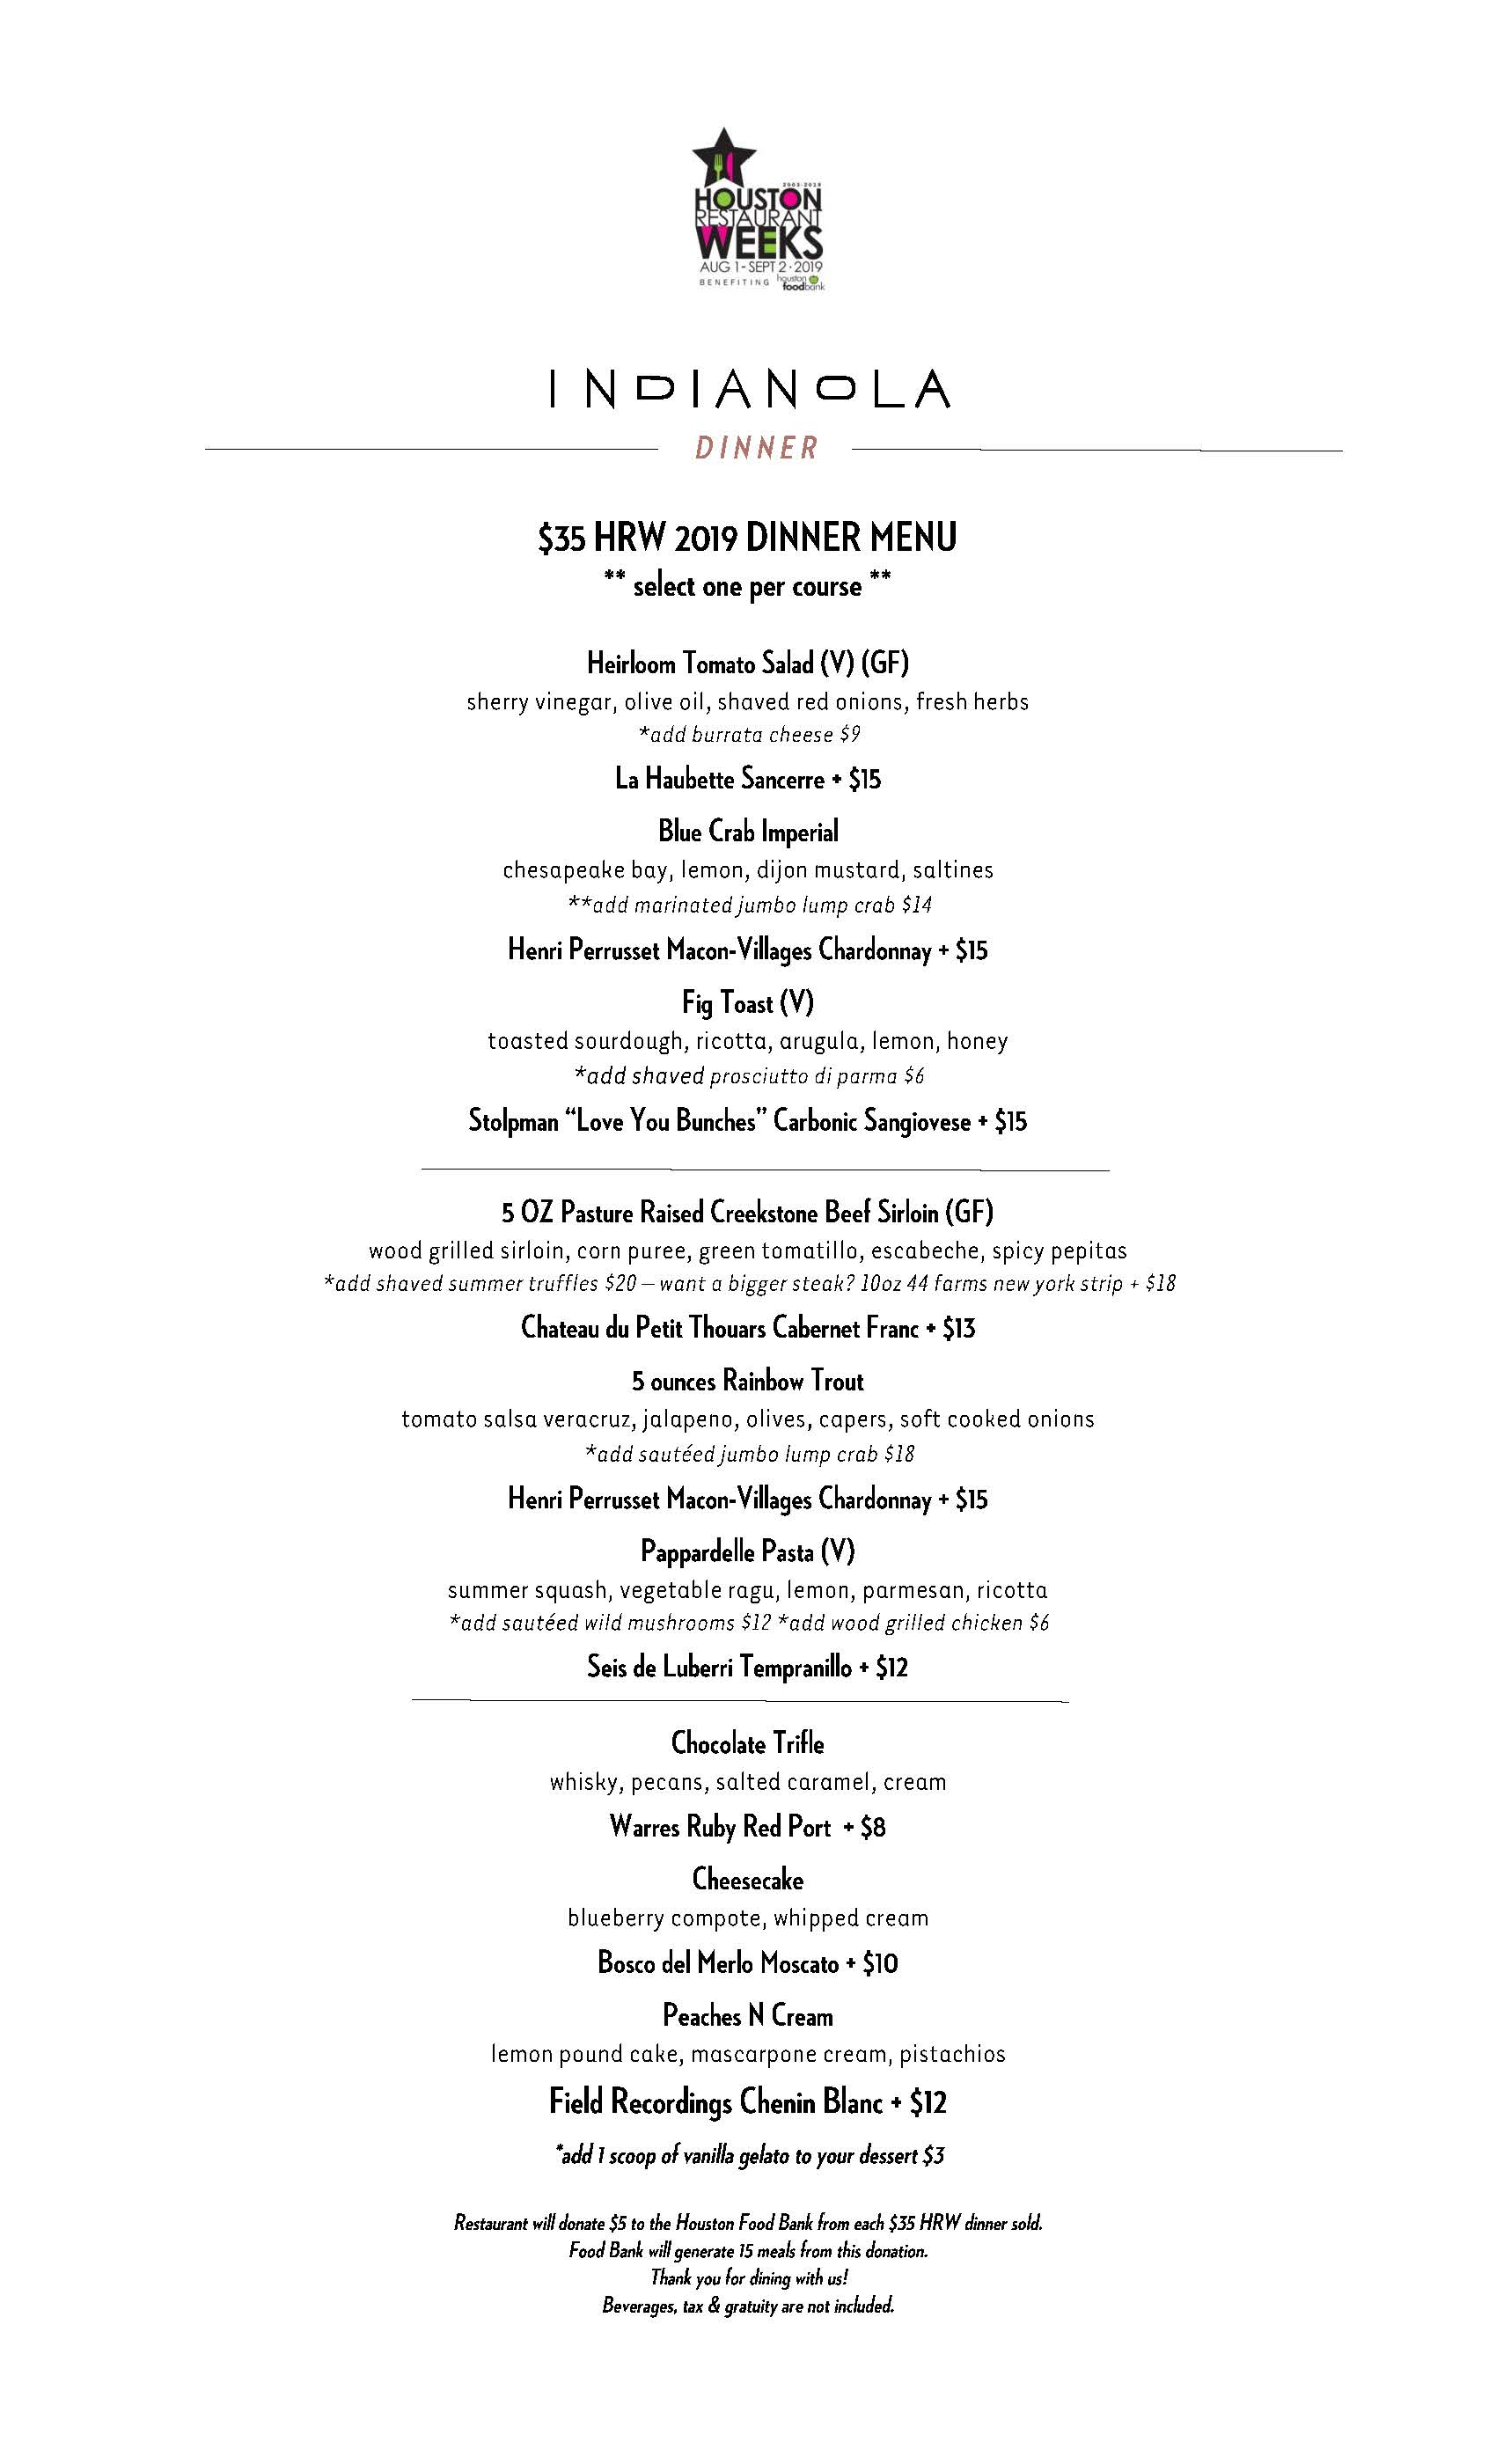 HRW 2019 - $35 Dinner Menu Indianola 2.jpg